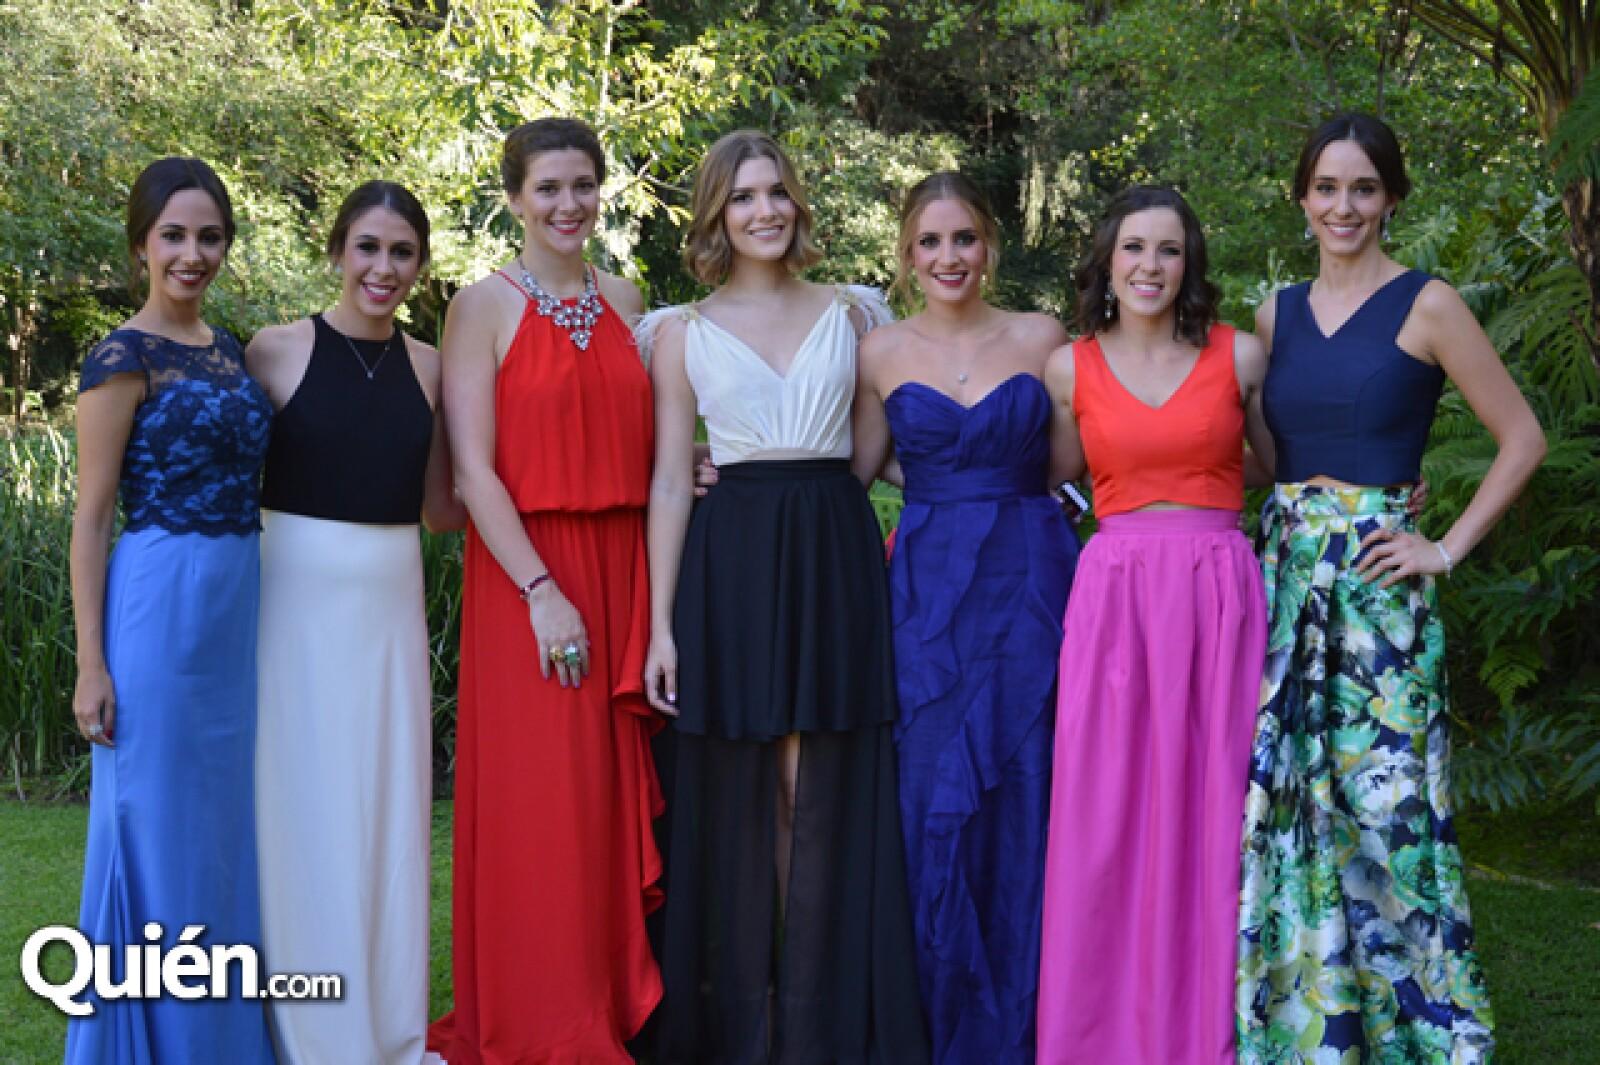 Lore Díaz,Claudia Garabini,Eli Briceño,Luisa Cárdenas,Giannica Musella,Lore Lázaro,Lore Luengo